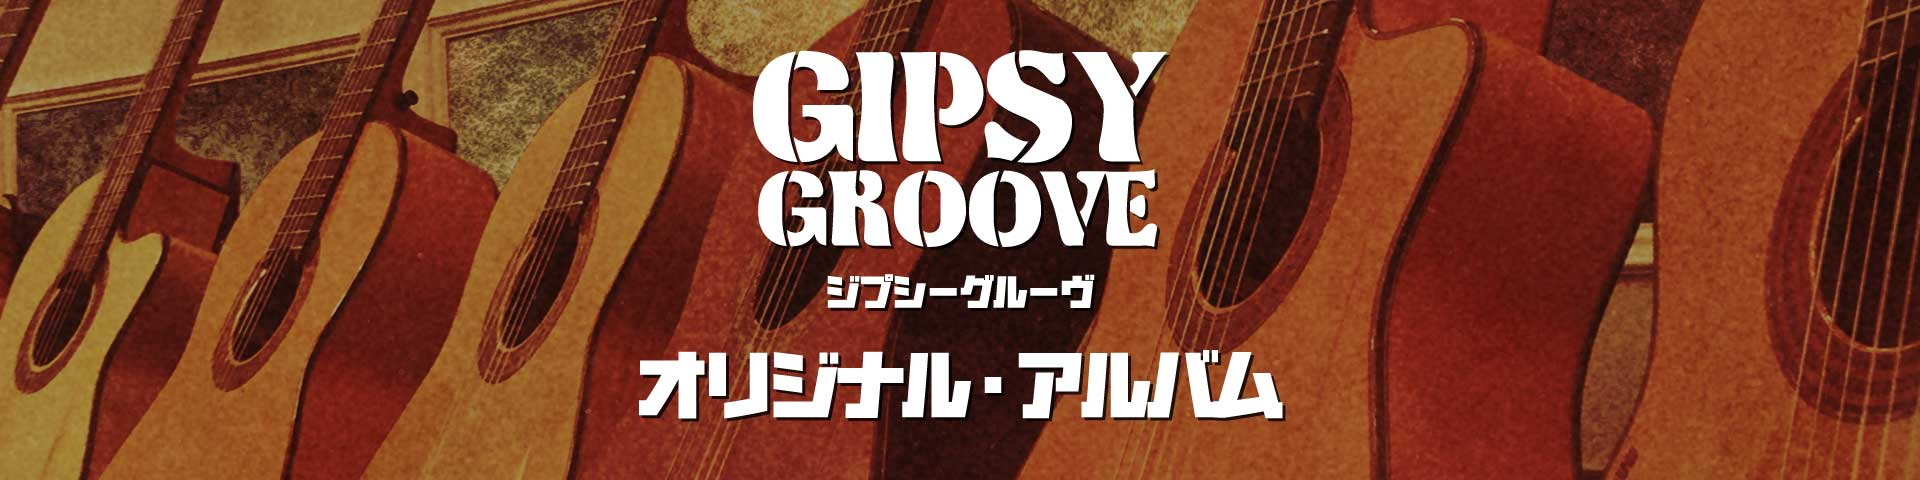 Gipsy Groove オリジナルアルバム